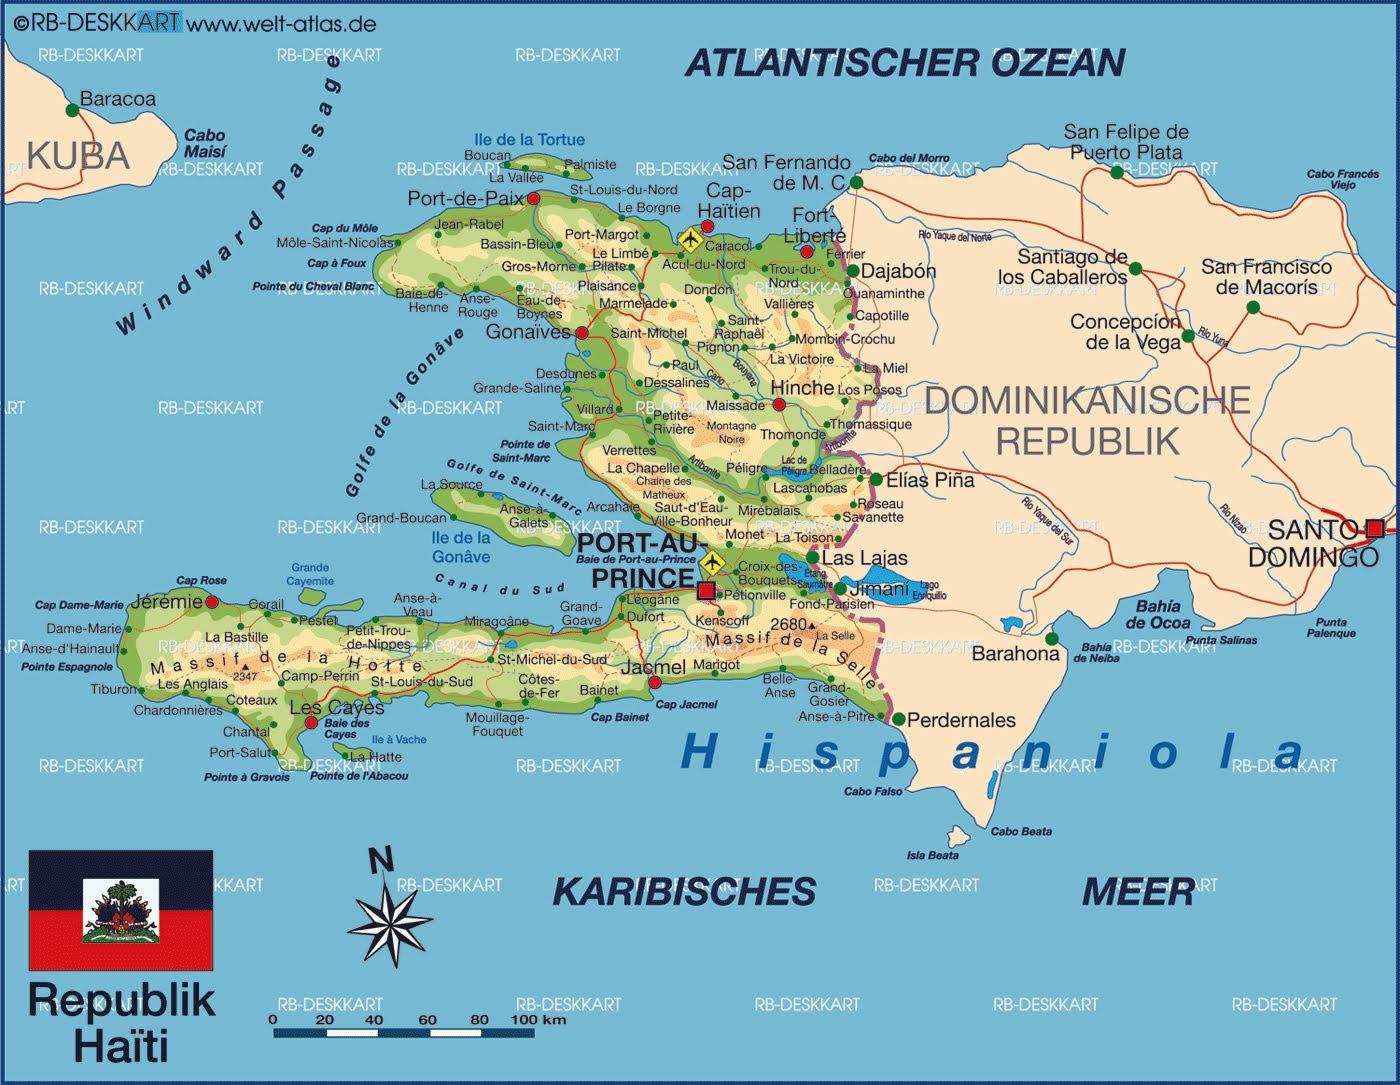 FoodFuel: Haiti's Quake, Hurricanes, Political Upheavals, Food